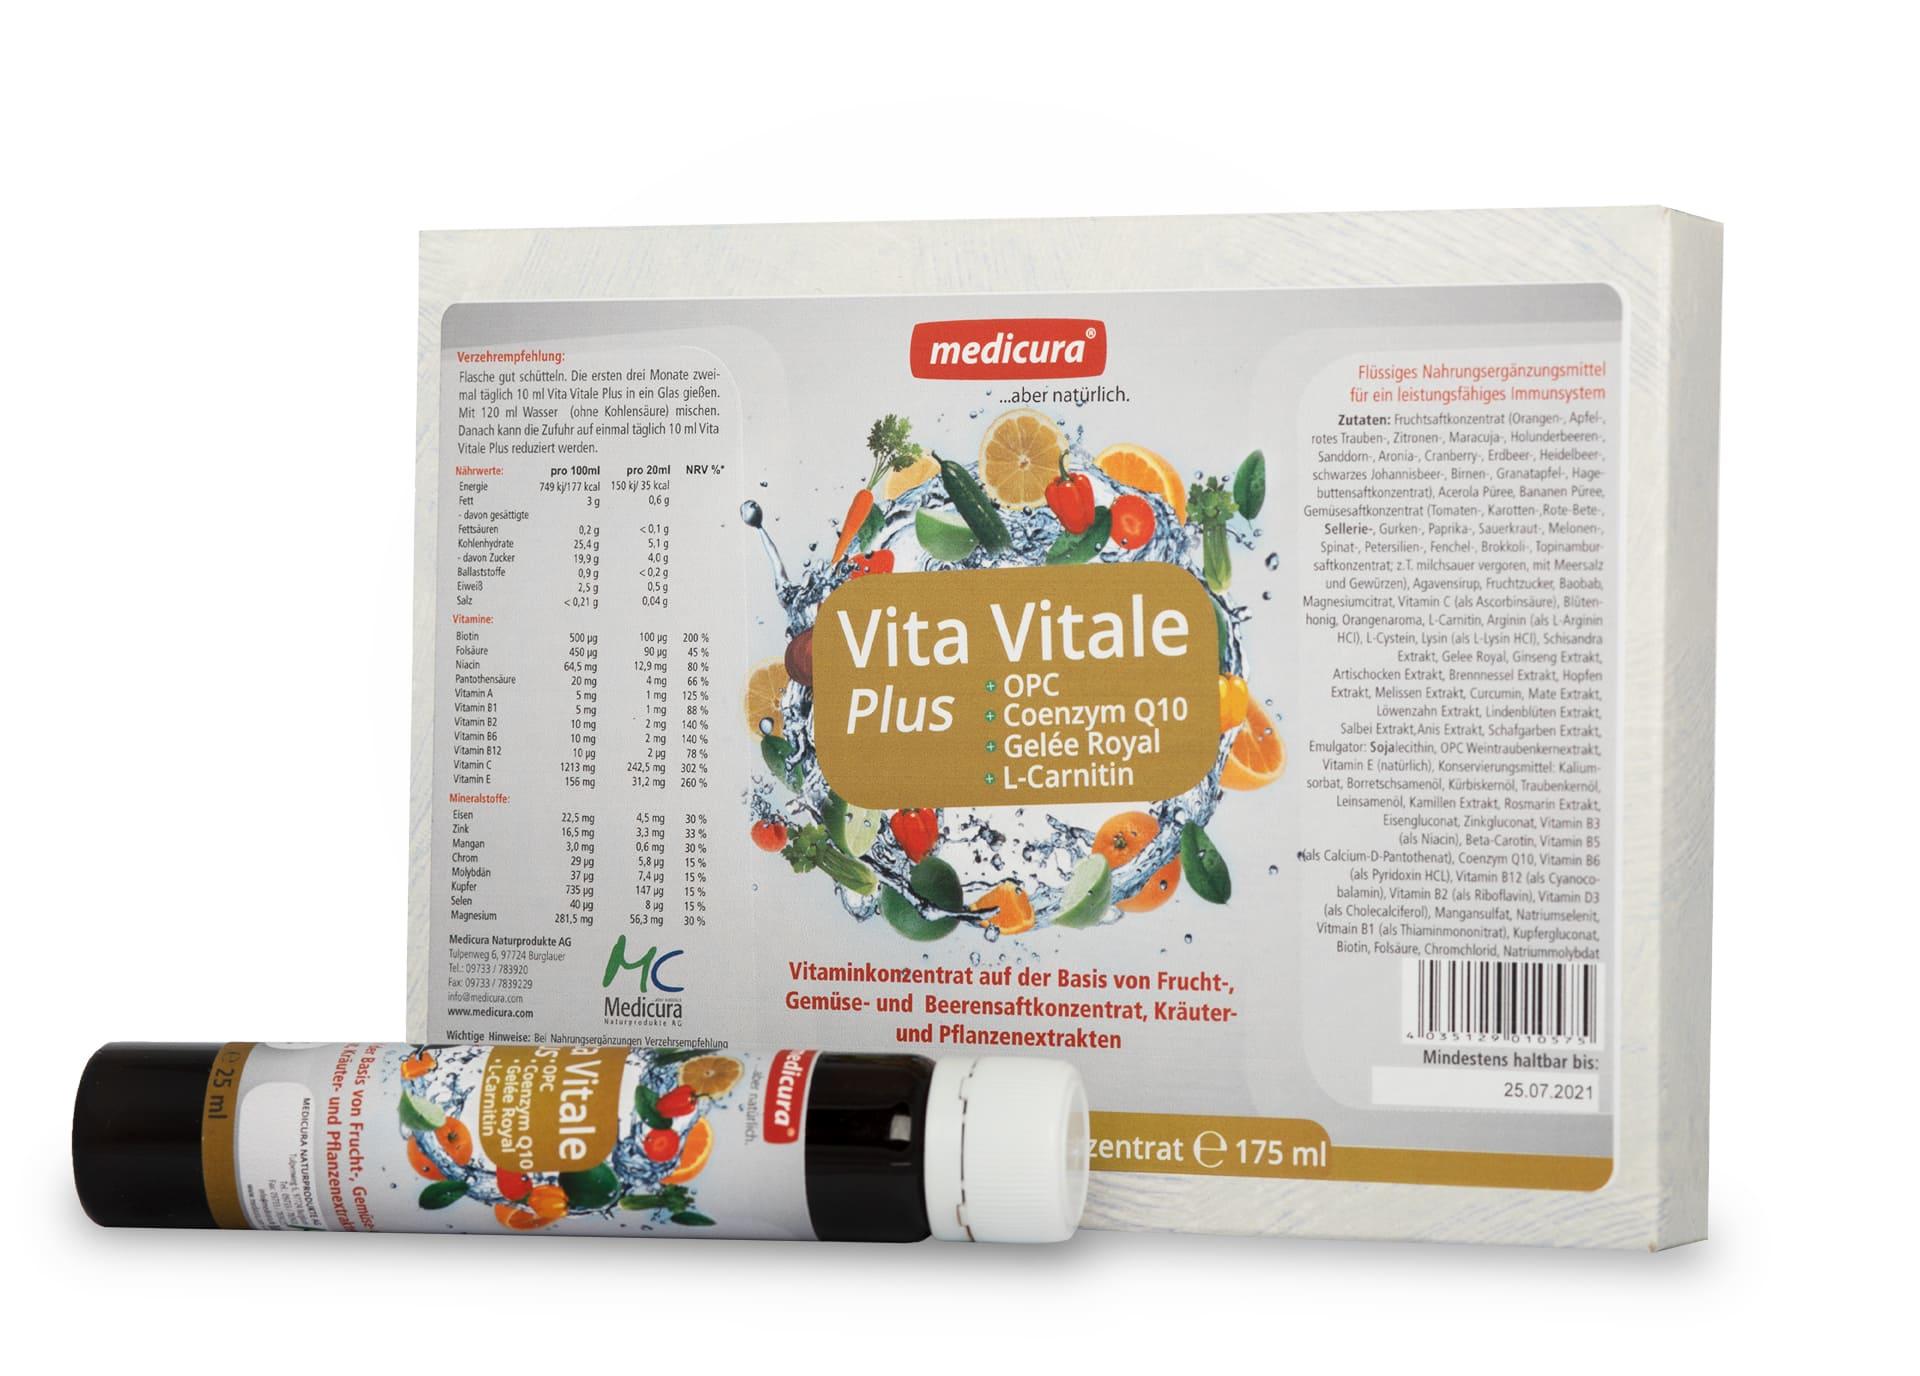 Vita Vitale Plus + OPC +Coenzym Q10 + Gelée Royal + L-Carnitin (Vitaminkonzentrat 1:12)